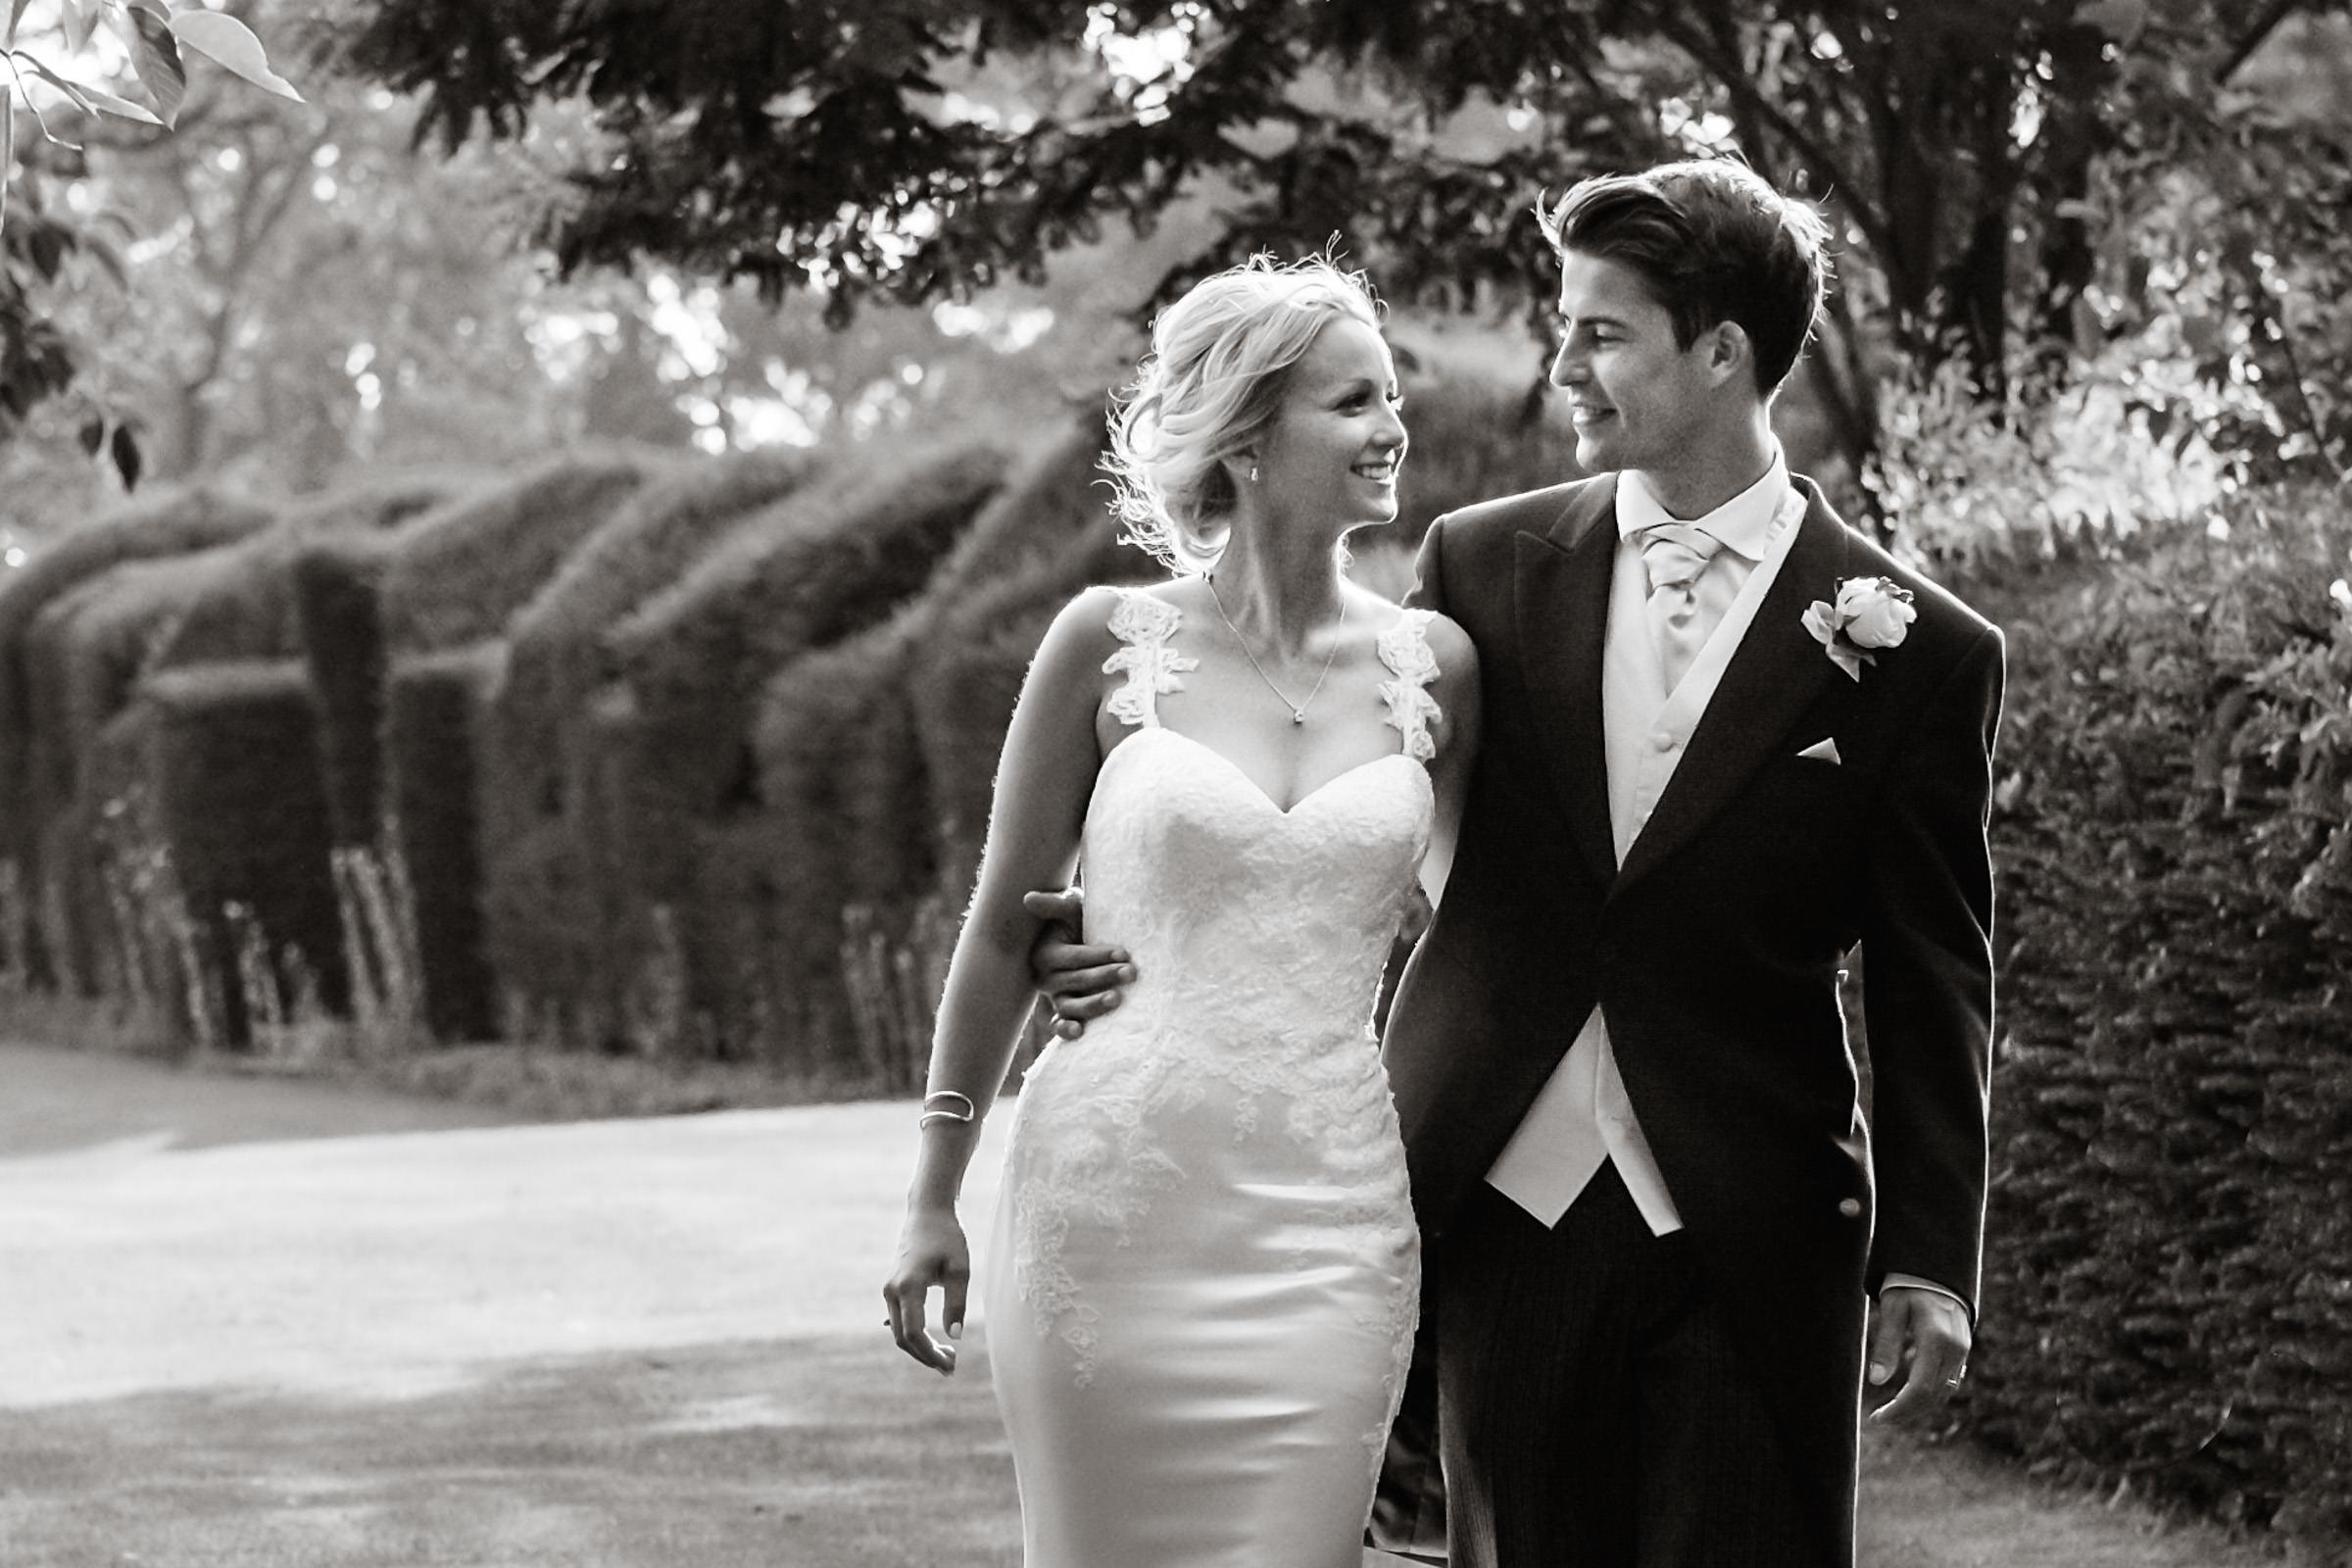 Wedding+at+Parkside+School+in+Surrey+027.jpg